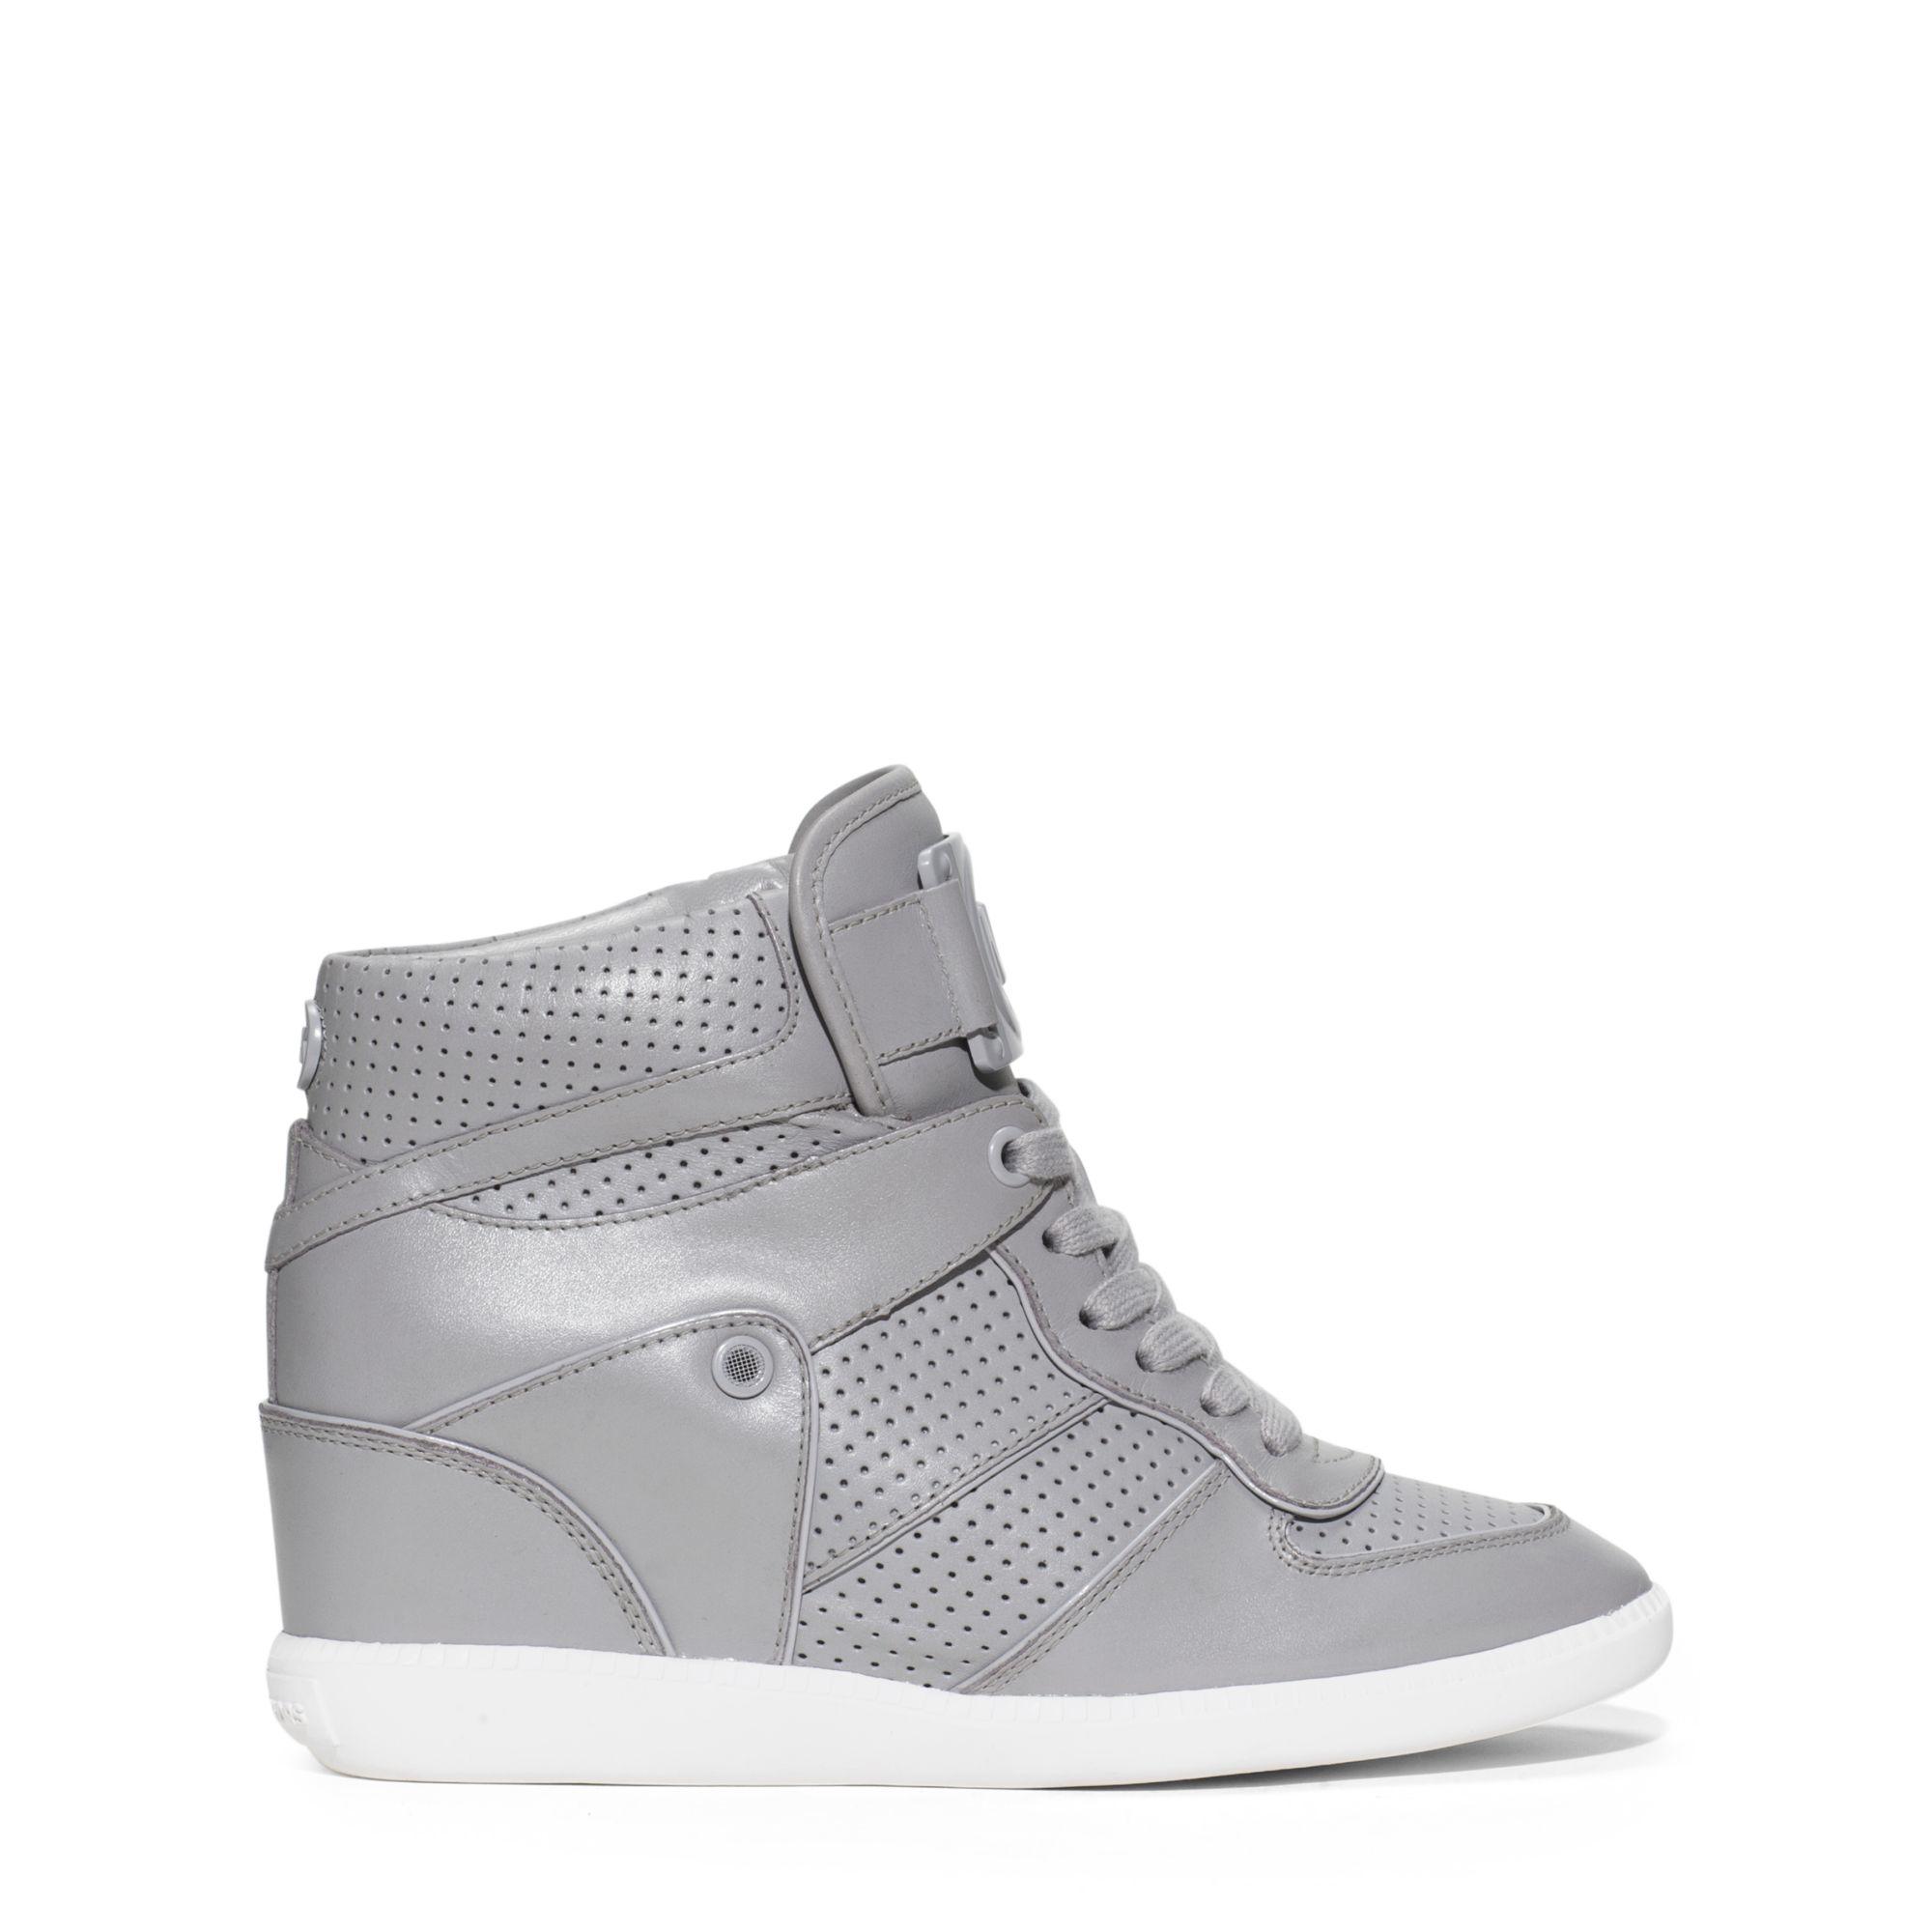 michael kors nikko high top leather sneaker in gray lyst. Black Bedroom Furniture Sets. Home Design Ideas